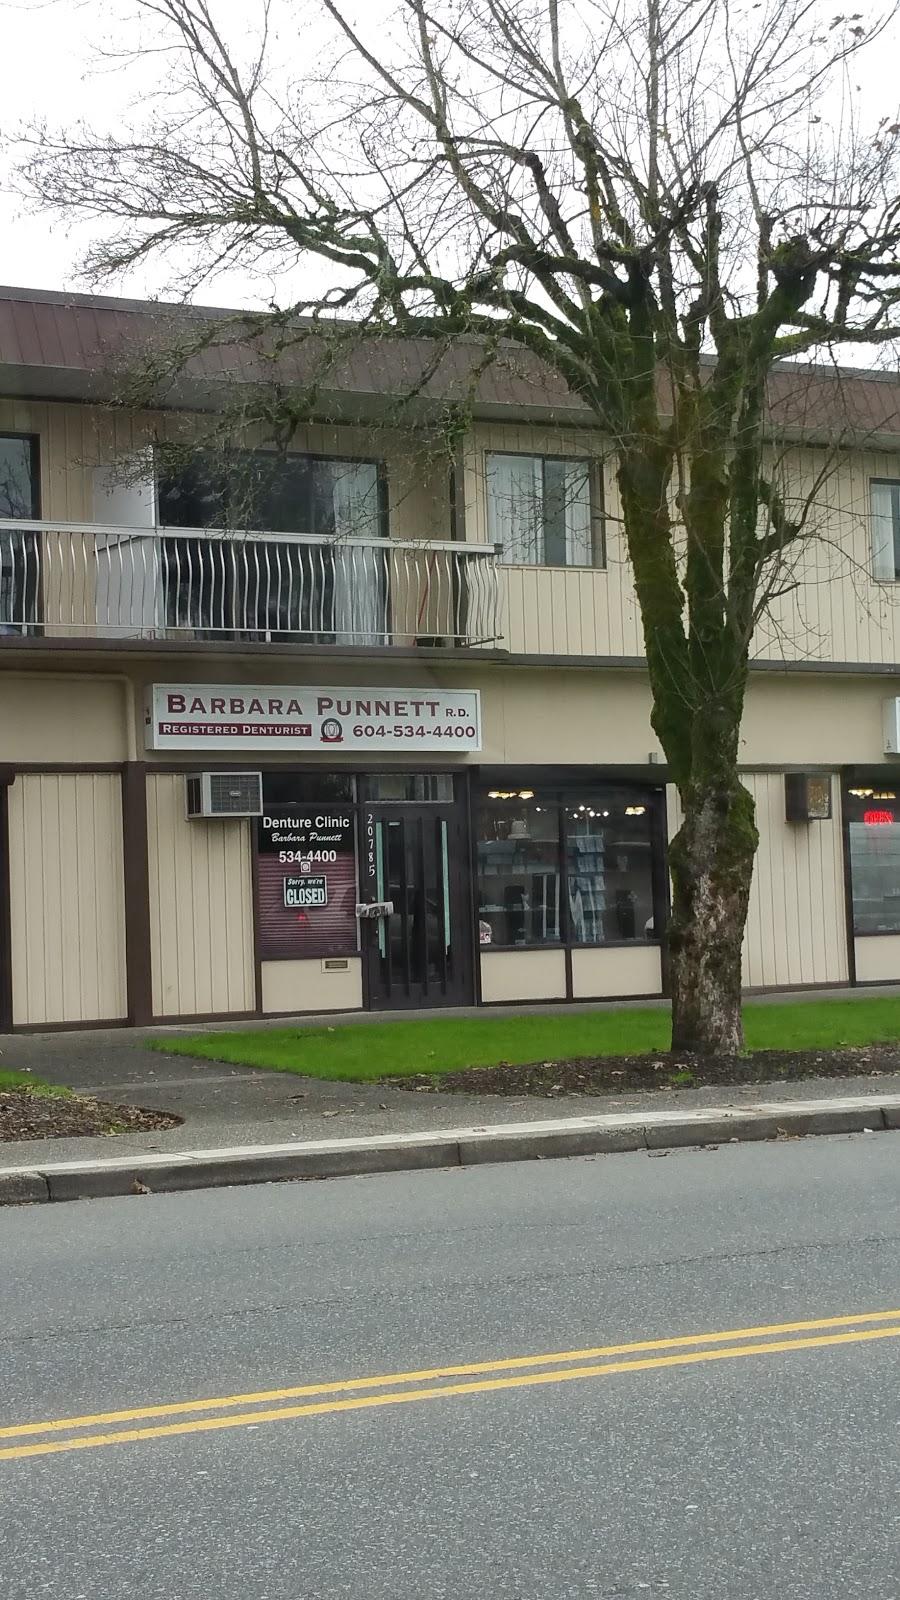 Barbara A. Punnett | dentist | 20785 Fraser Hwy, Langley City, BC V3A 4G4, Canada | 6045344400 OR +1 604-534-4400